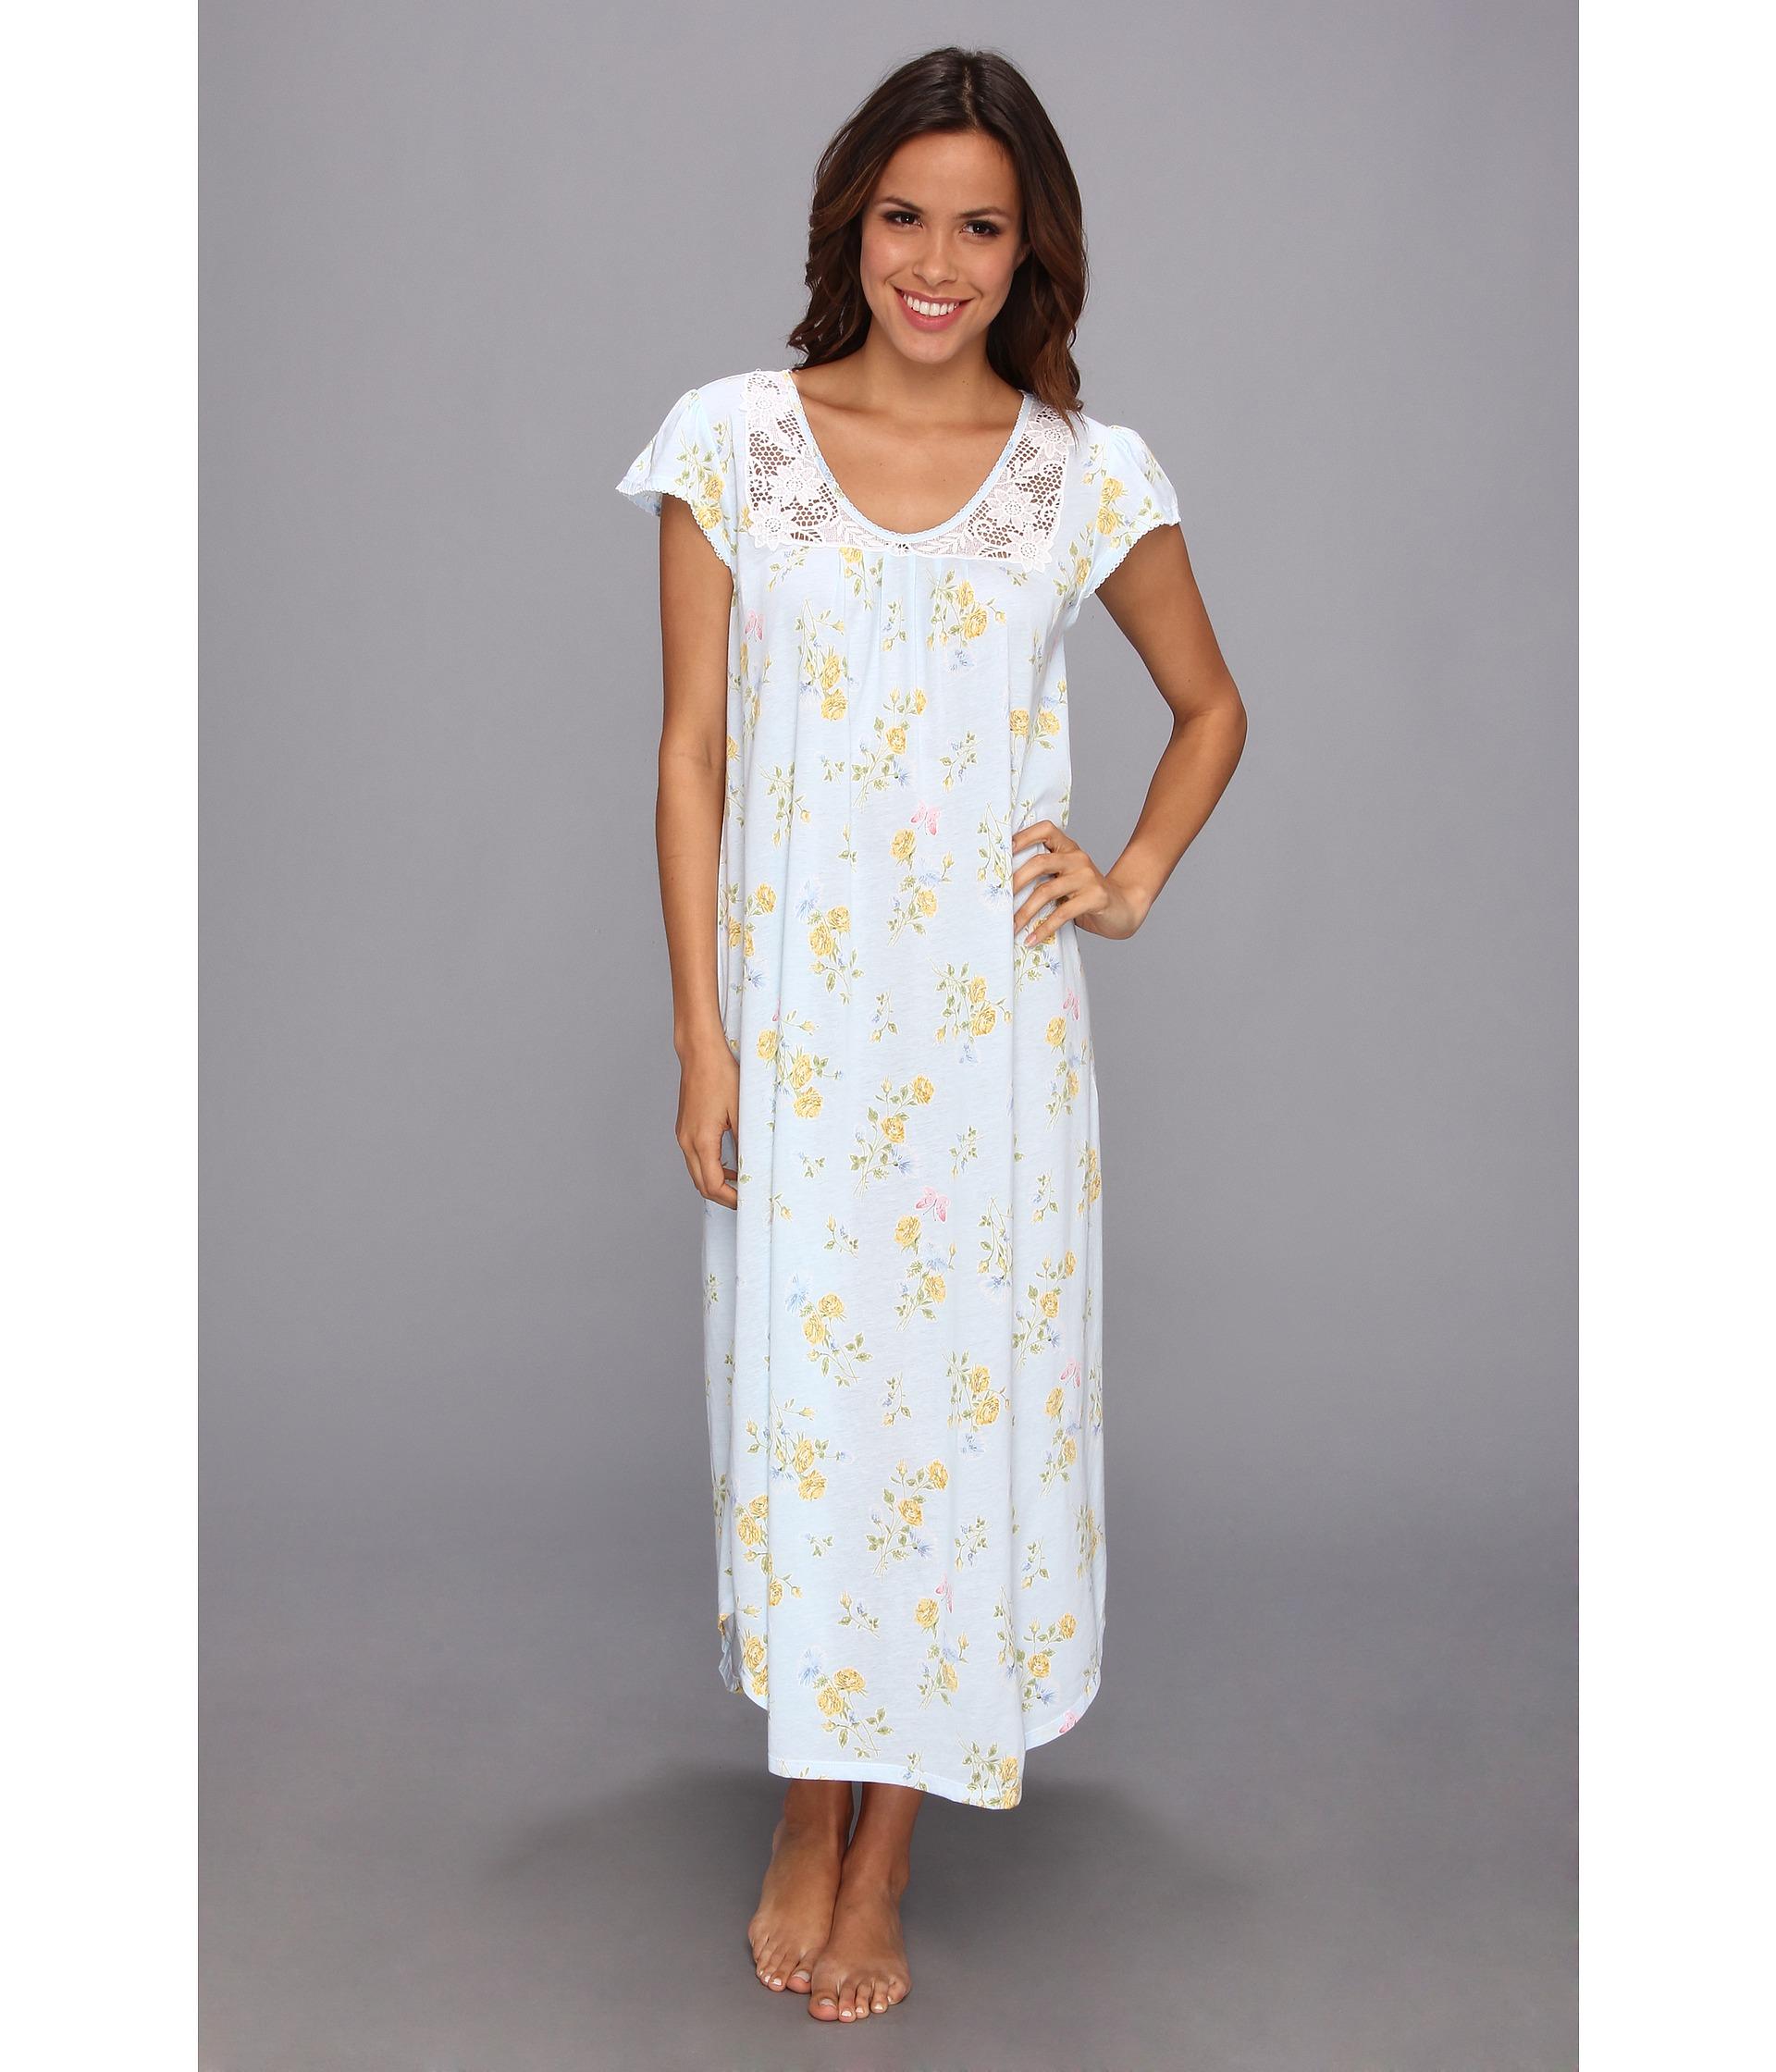 07f07c7bdc Lyst - Carole Hochman Garden Reverie Long Nightgown